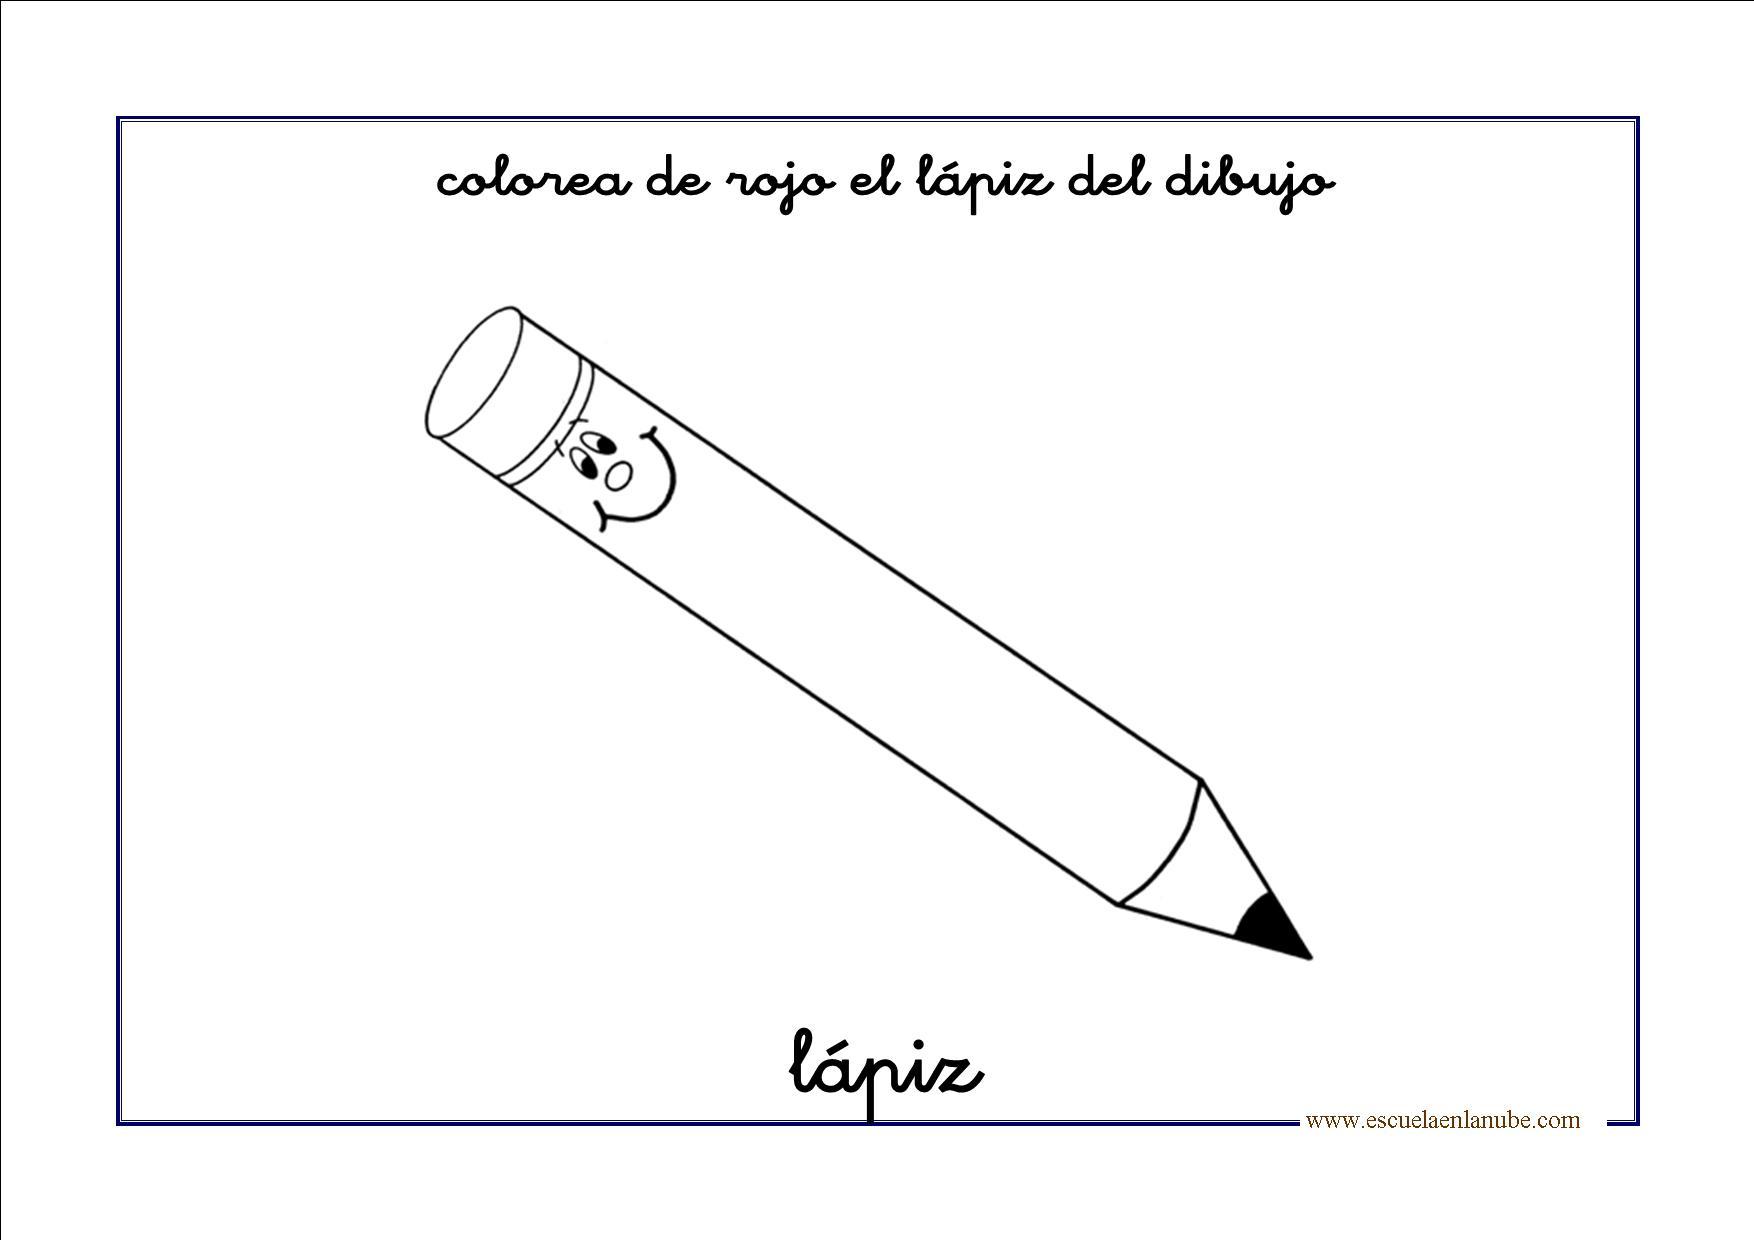 Dibujos Para Colorear Lapiz. Cheap Dibujo Para Colorear